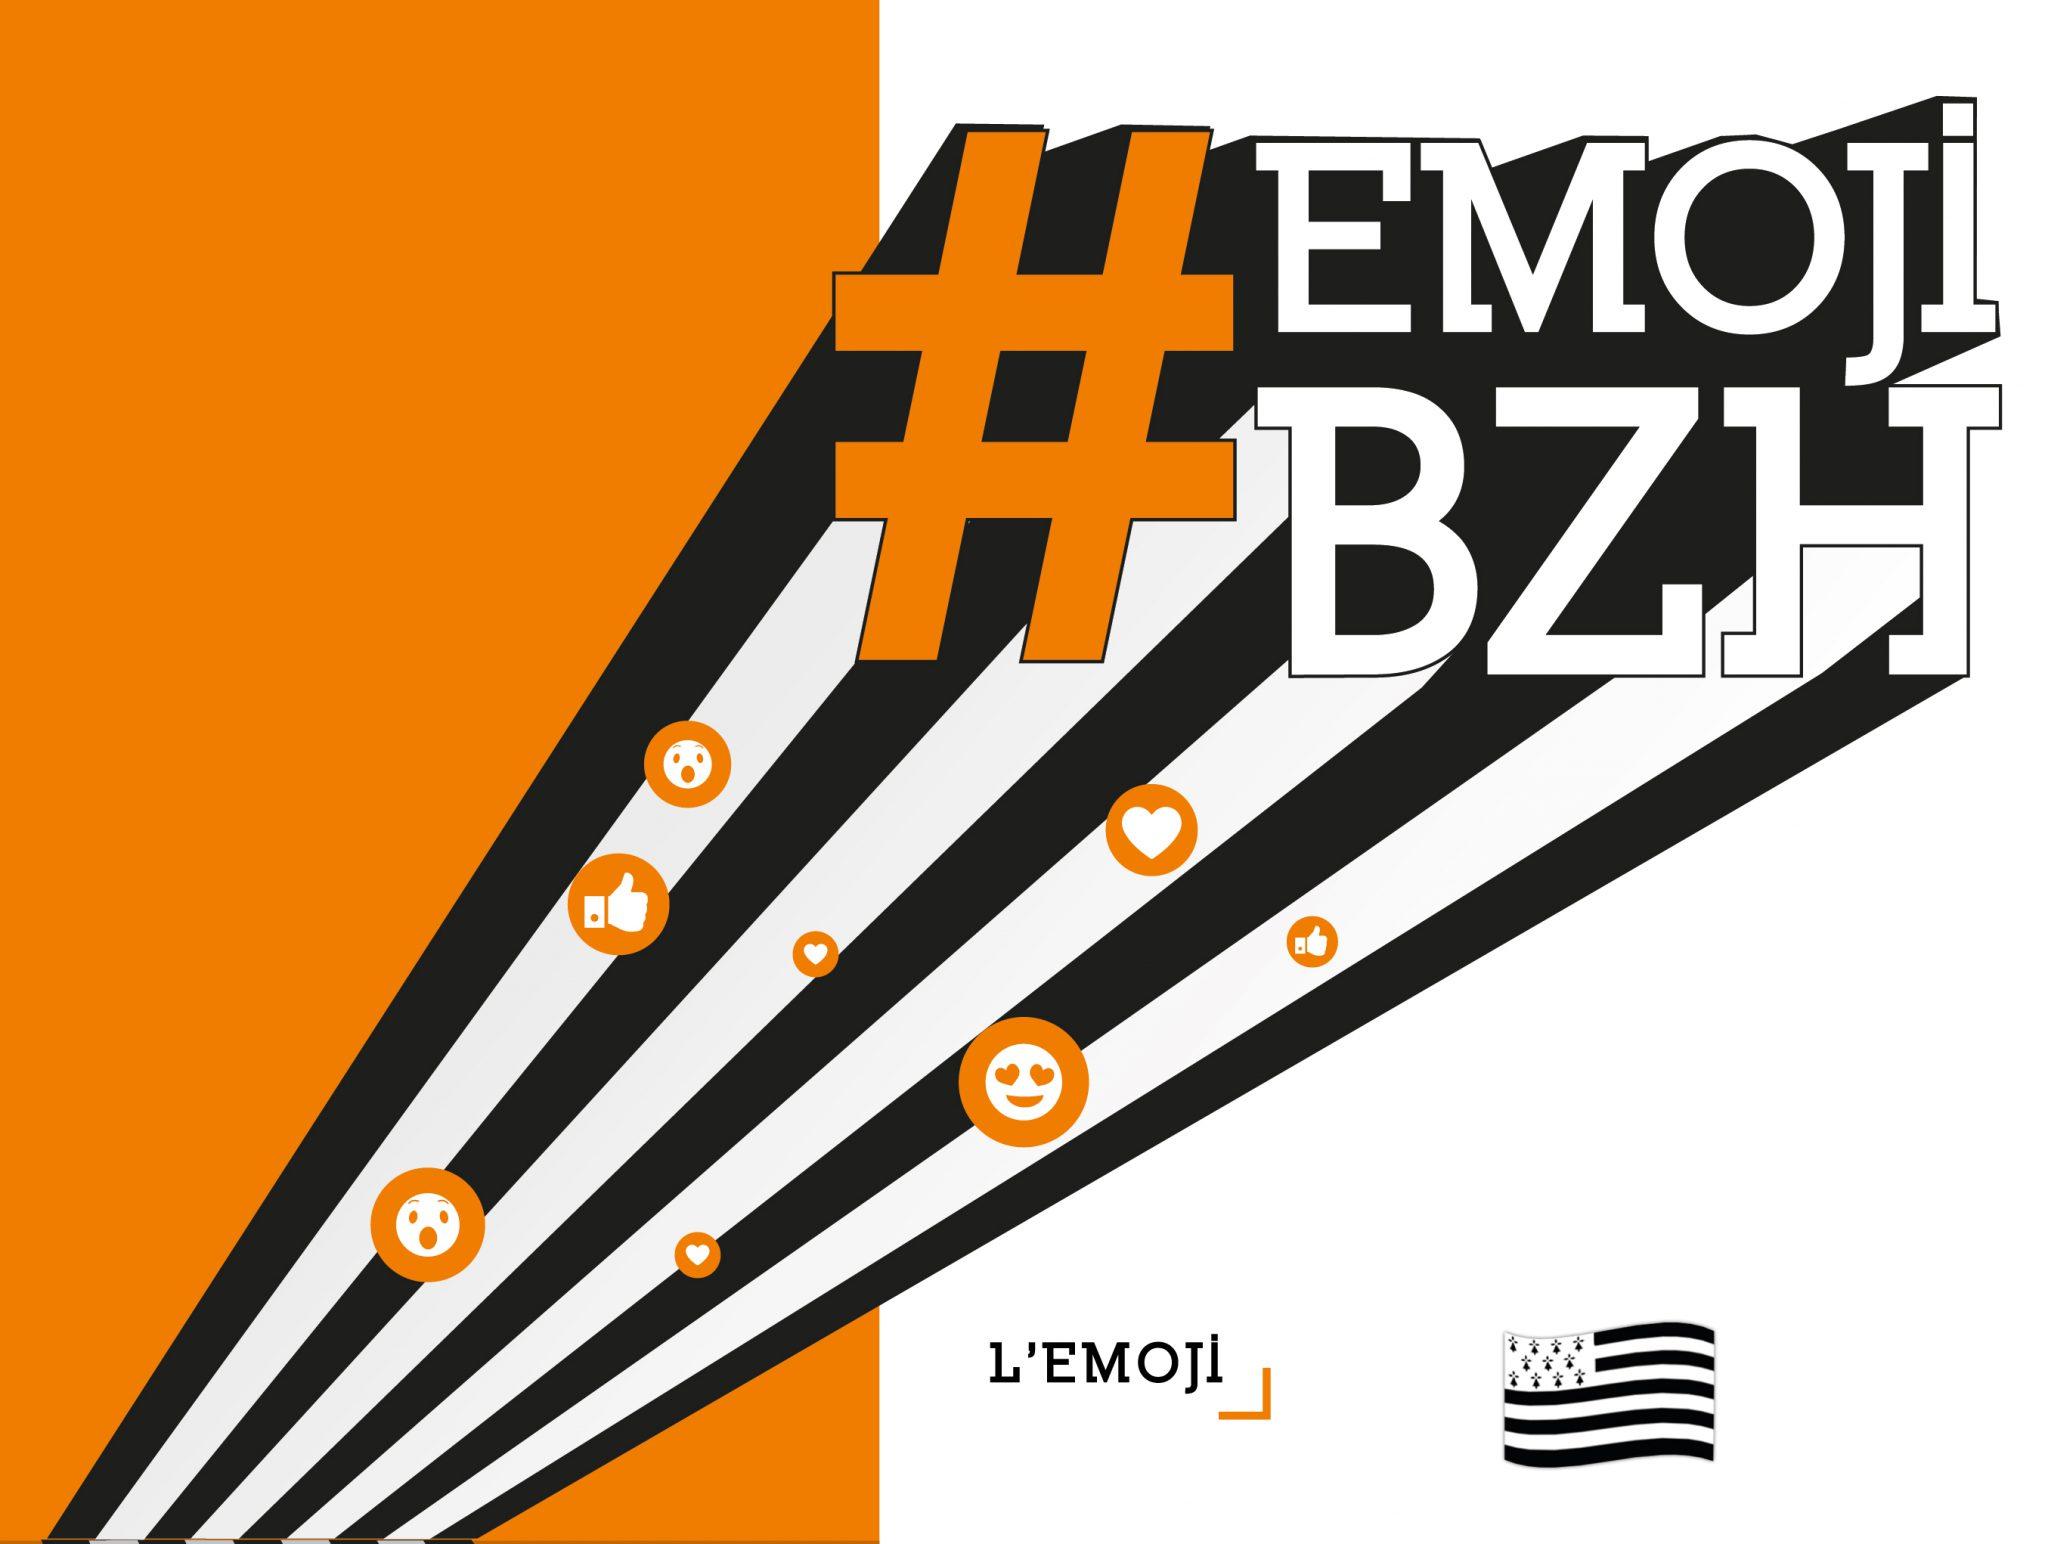 POINT-BZH-dossier-partenaires-bretagne-breton-lorient-drapeau-emoji-communication.jpg